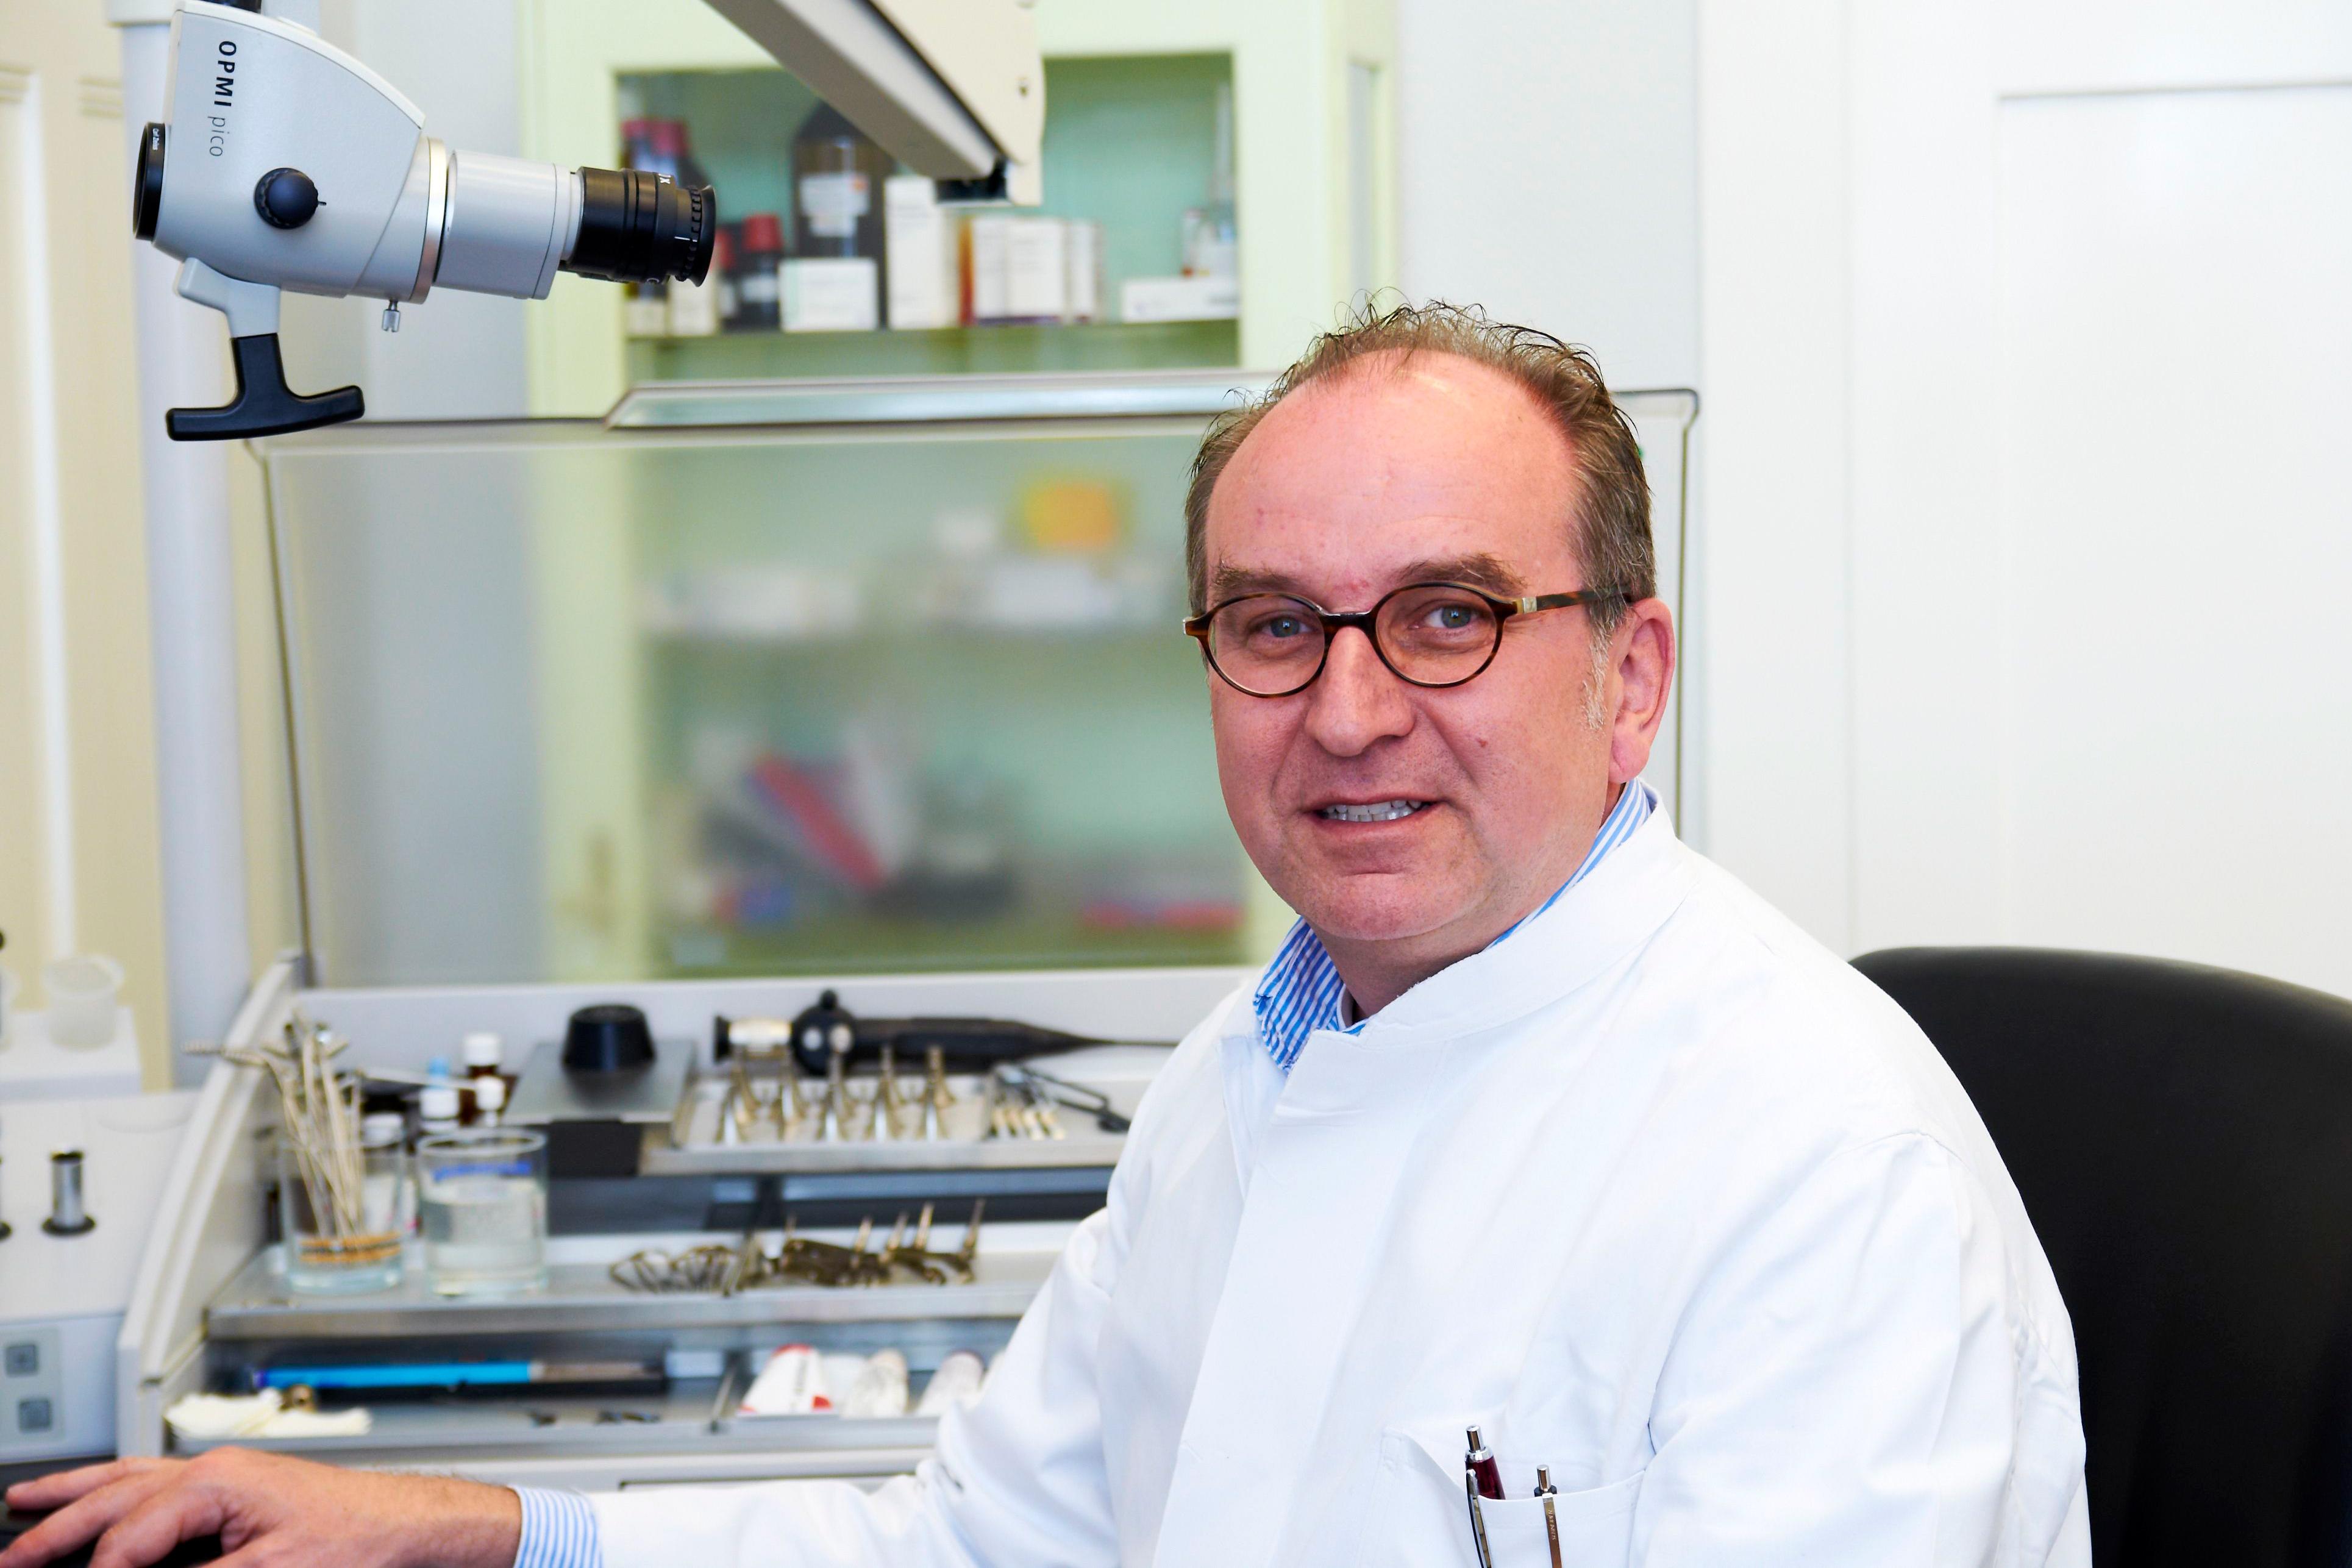 Hno Dr Sommer Düsseldorf